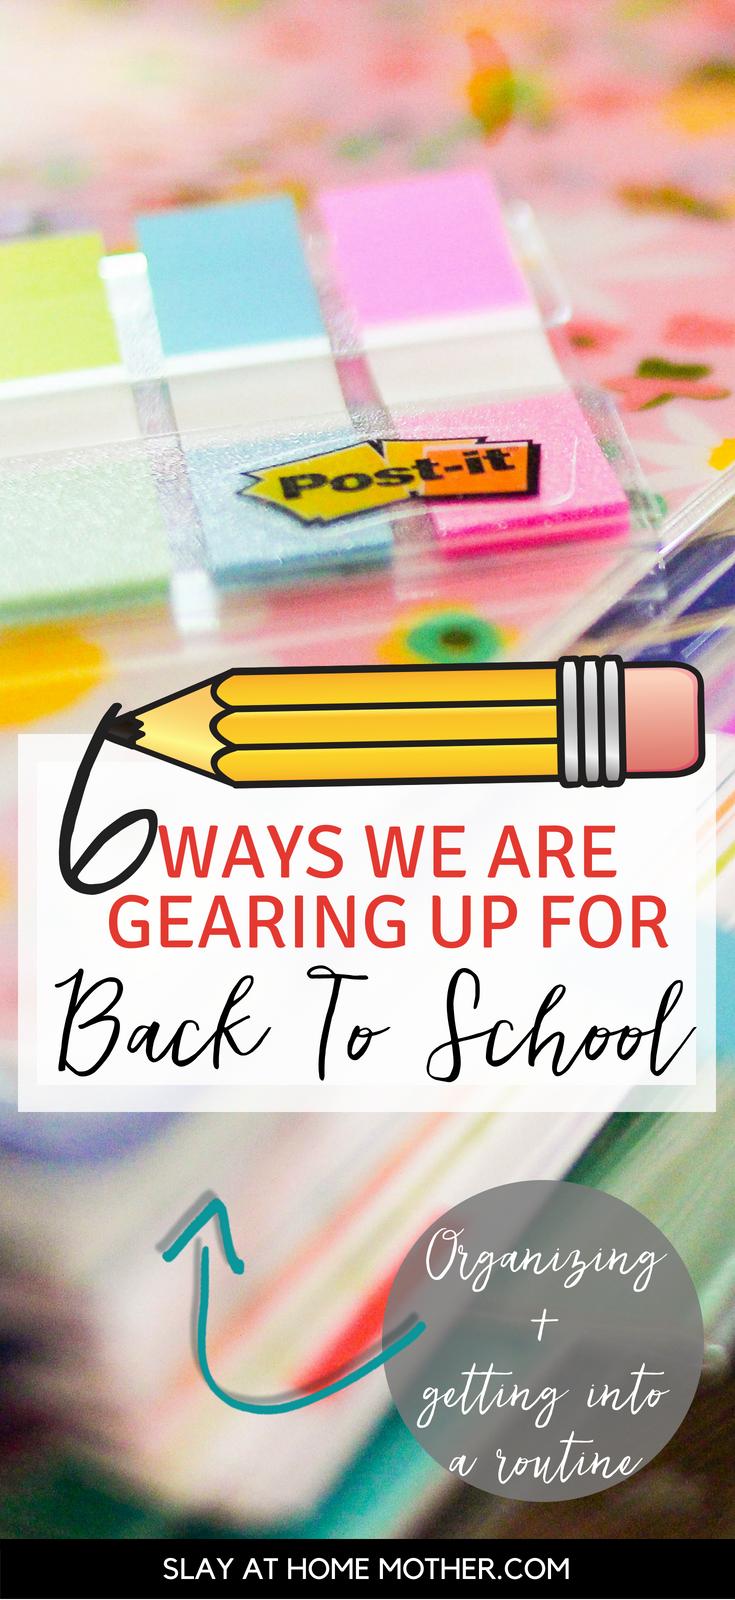 #ad 6 Ways We Are Gearing Up For Back-To-School - #BackToSchoolGoals18 #slayathomemother #backtoschool #schoolshopping -SlayAtHomeMother.com